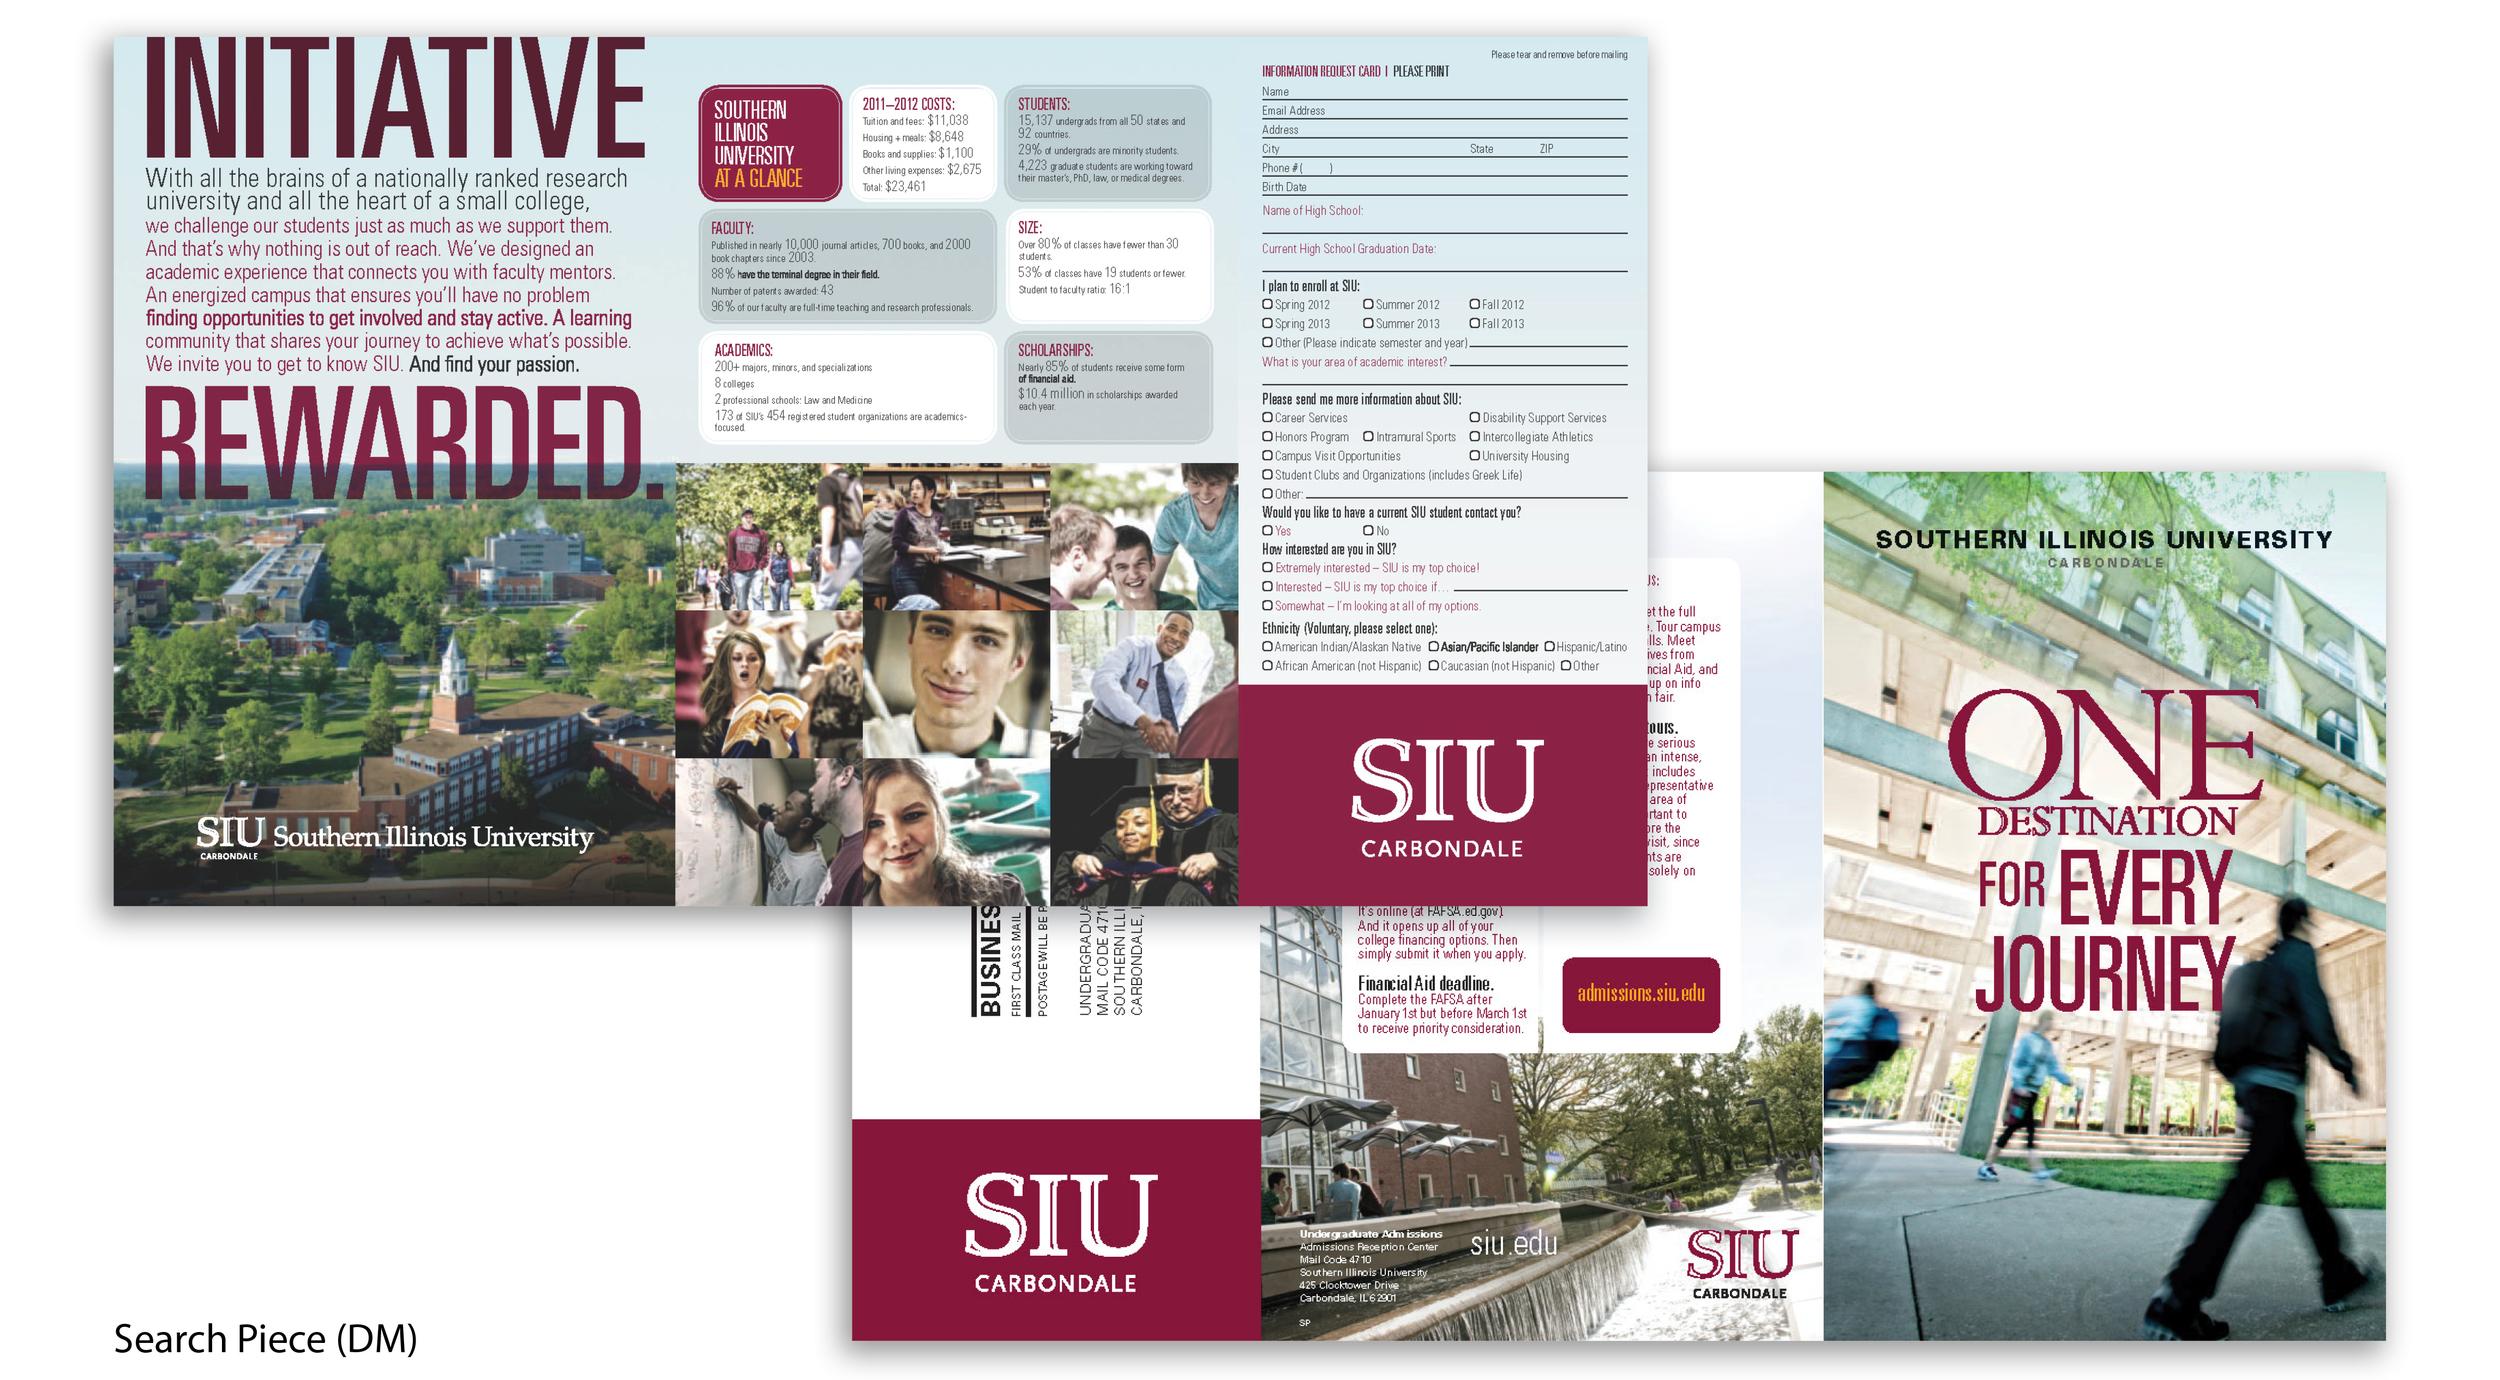 SIU_EnrollmentSlides7.jpg